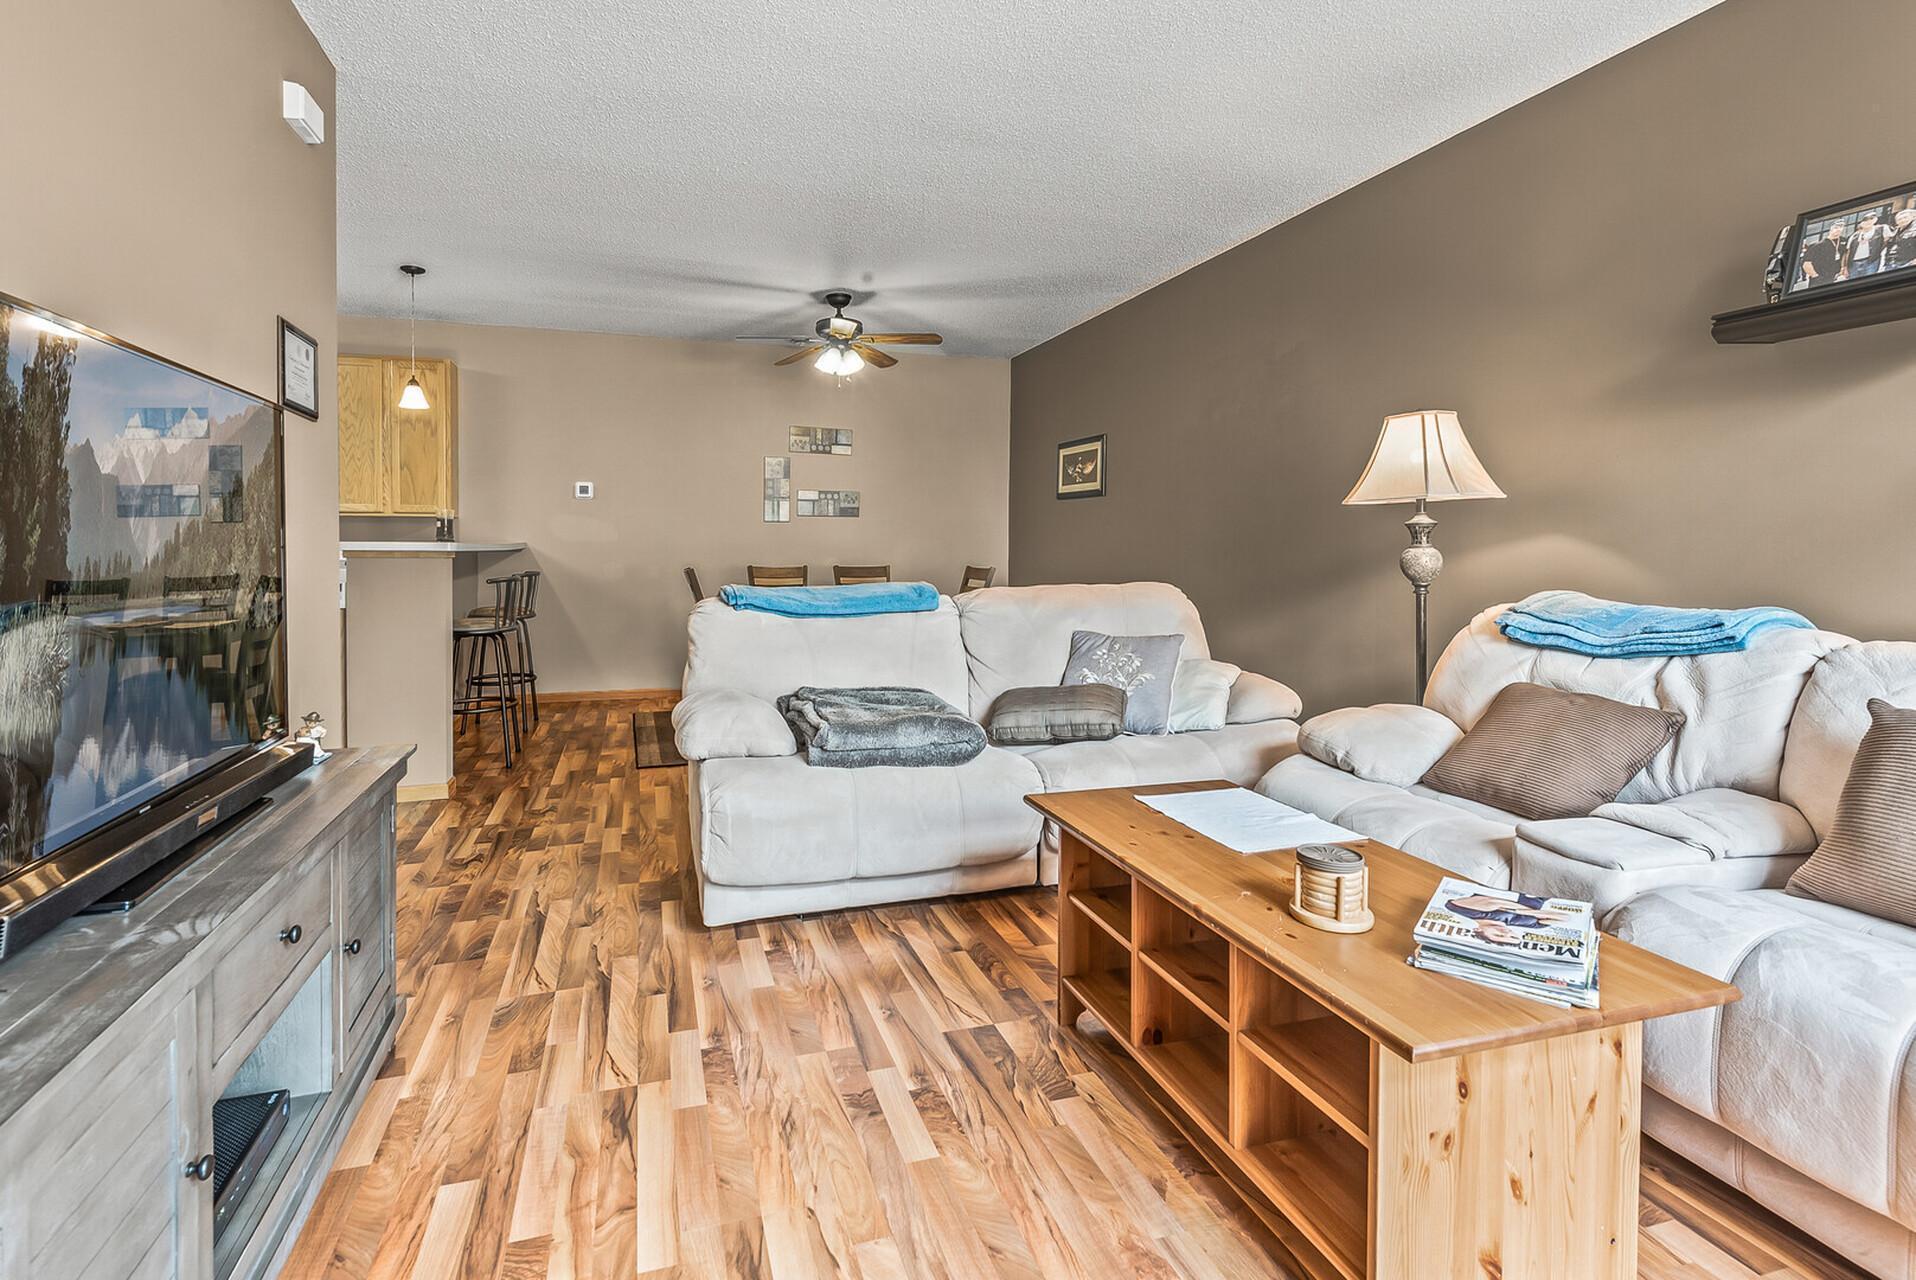 17964 69th Place N, Maple Grove MN 55311 - Photo 2